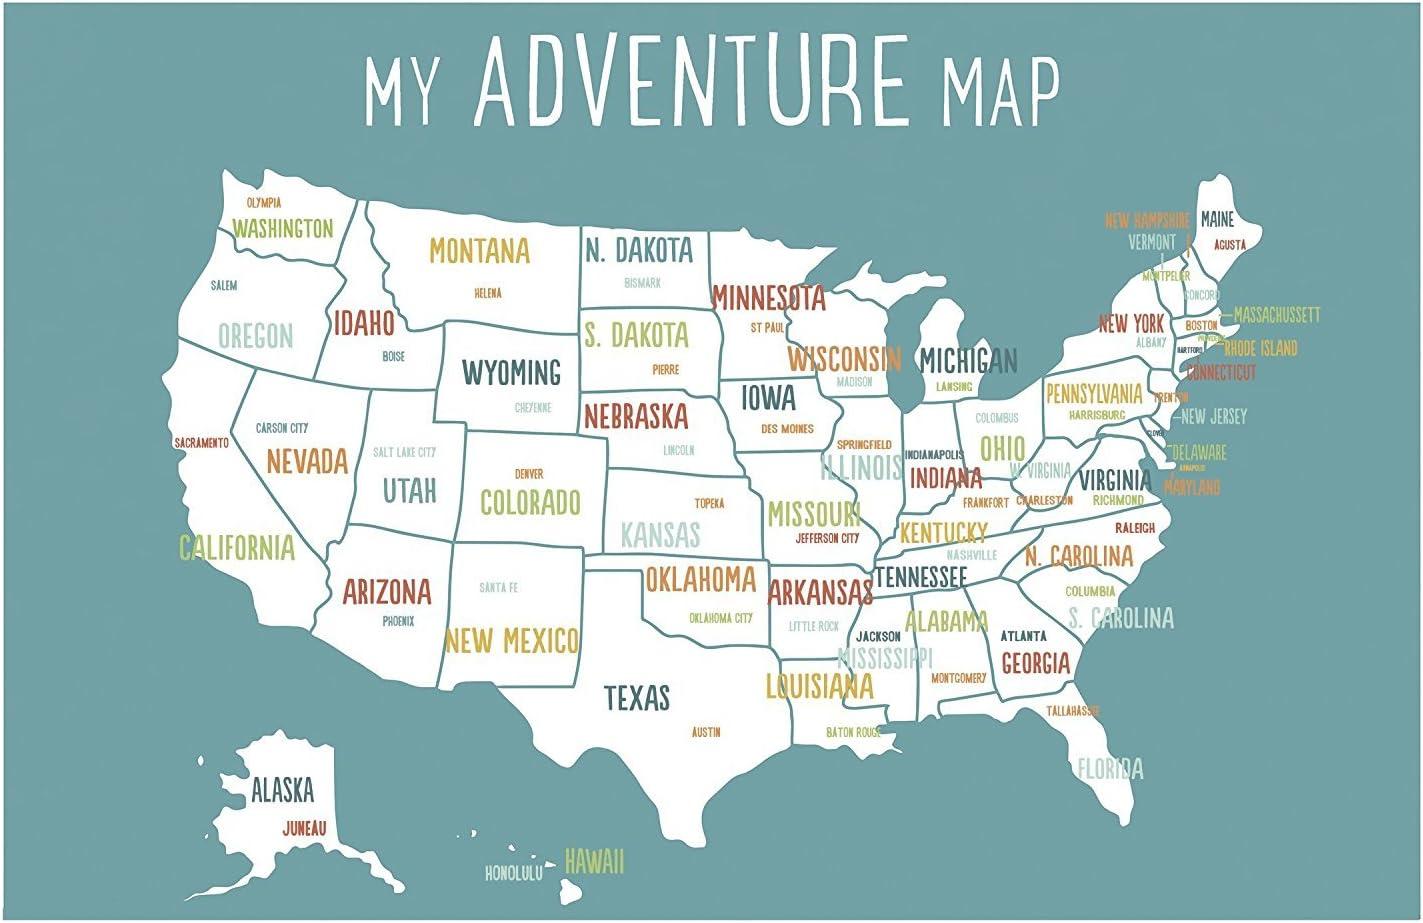 USA Adventure Wall Map Art Print, 11x14 Inch Print, Blue, Kid's USA Wall Map,Children's Room Decor, Gender Neutral Nursery, Travel Nursery Decor,United States of America Map